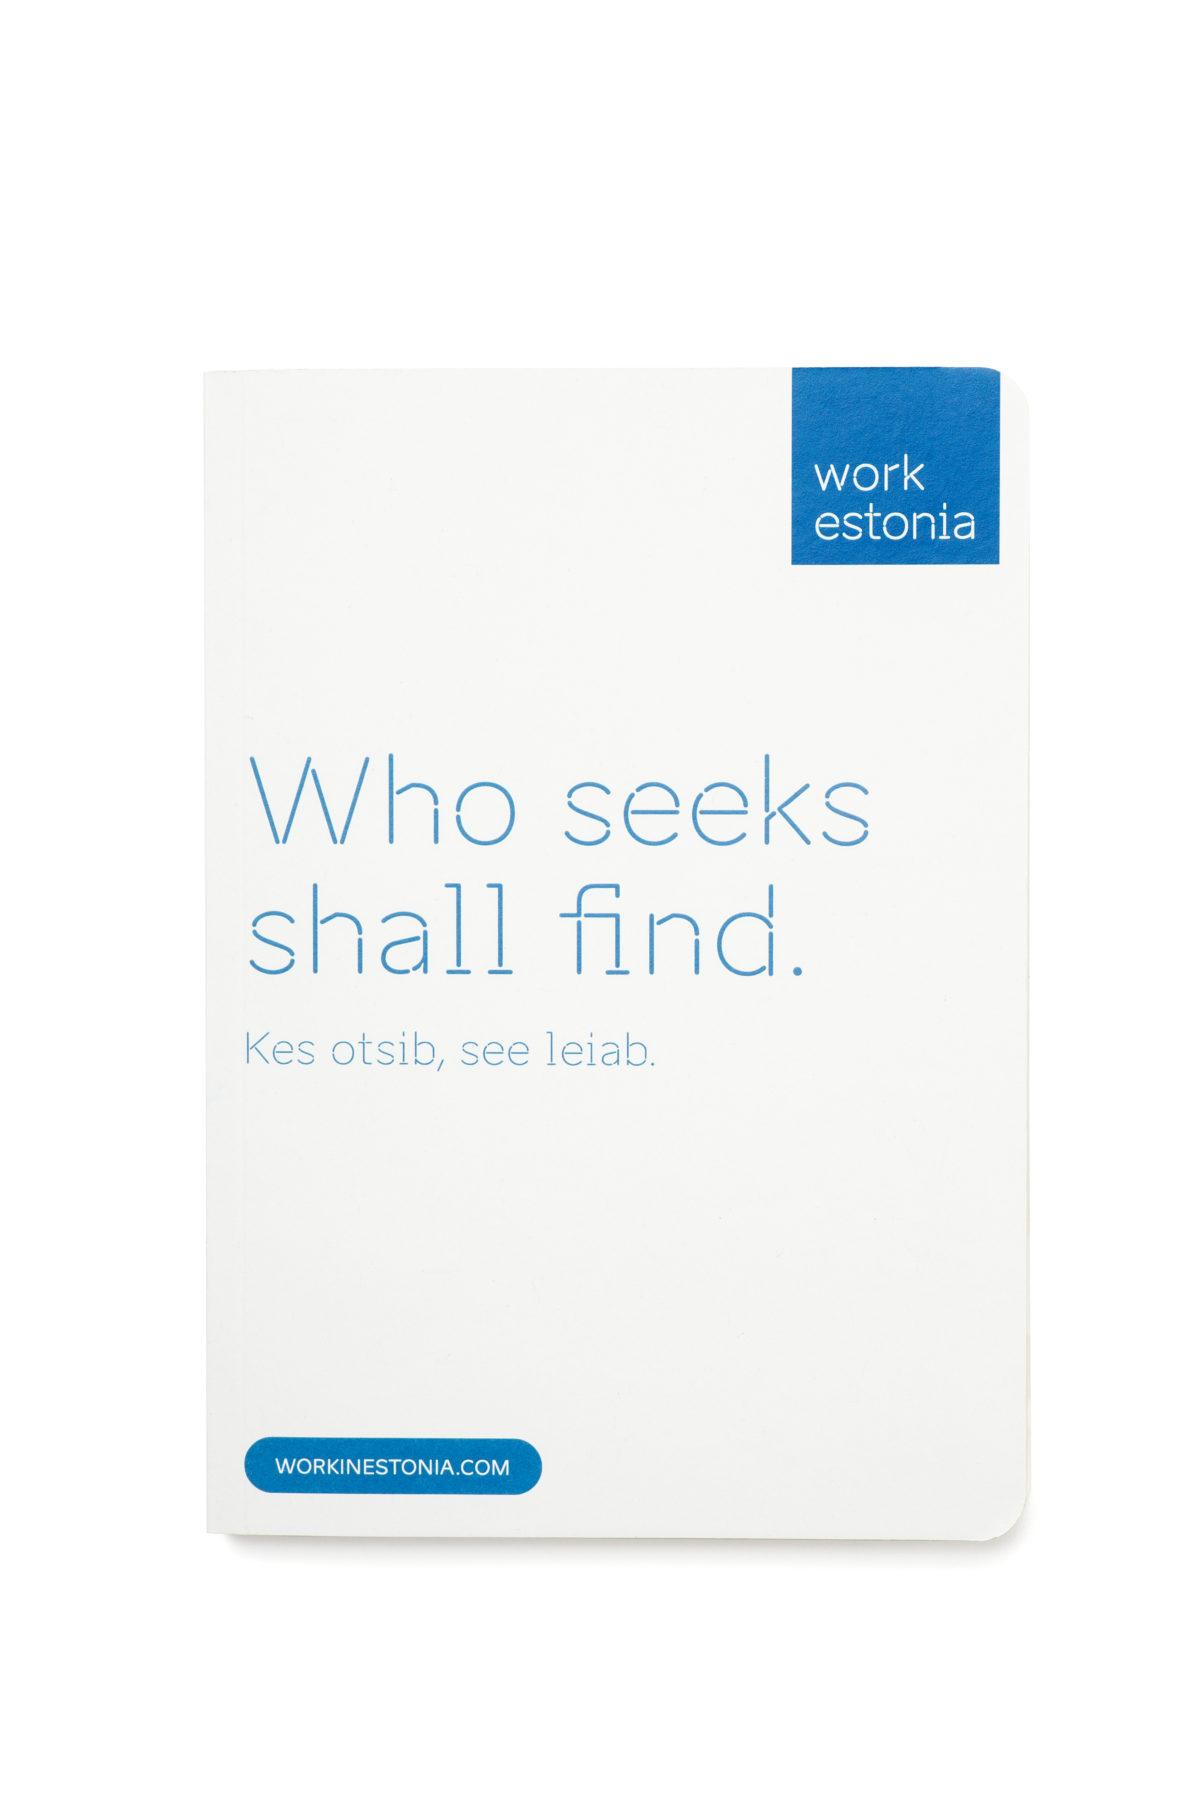 Work in Estonia notebook and pen